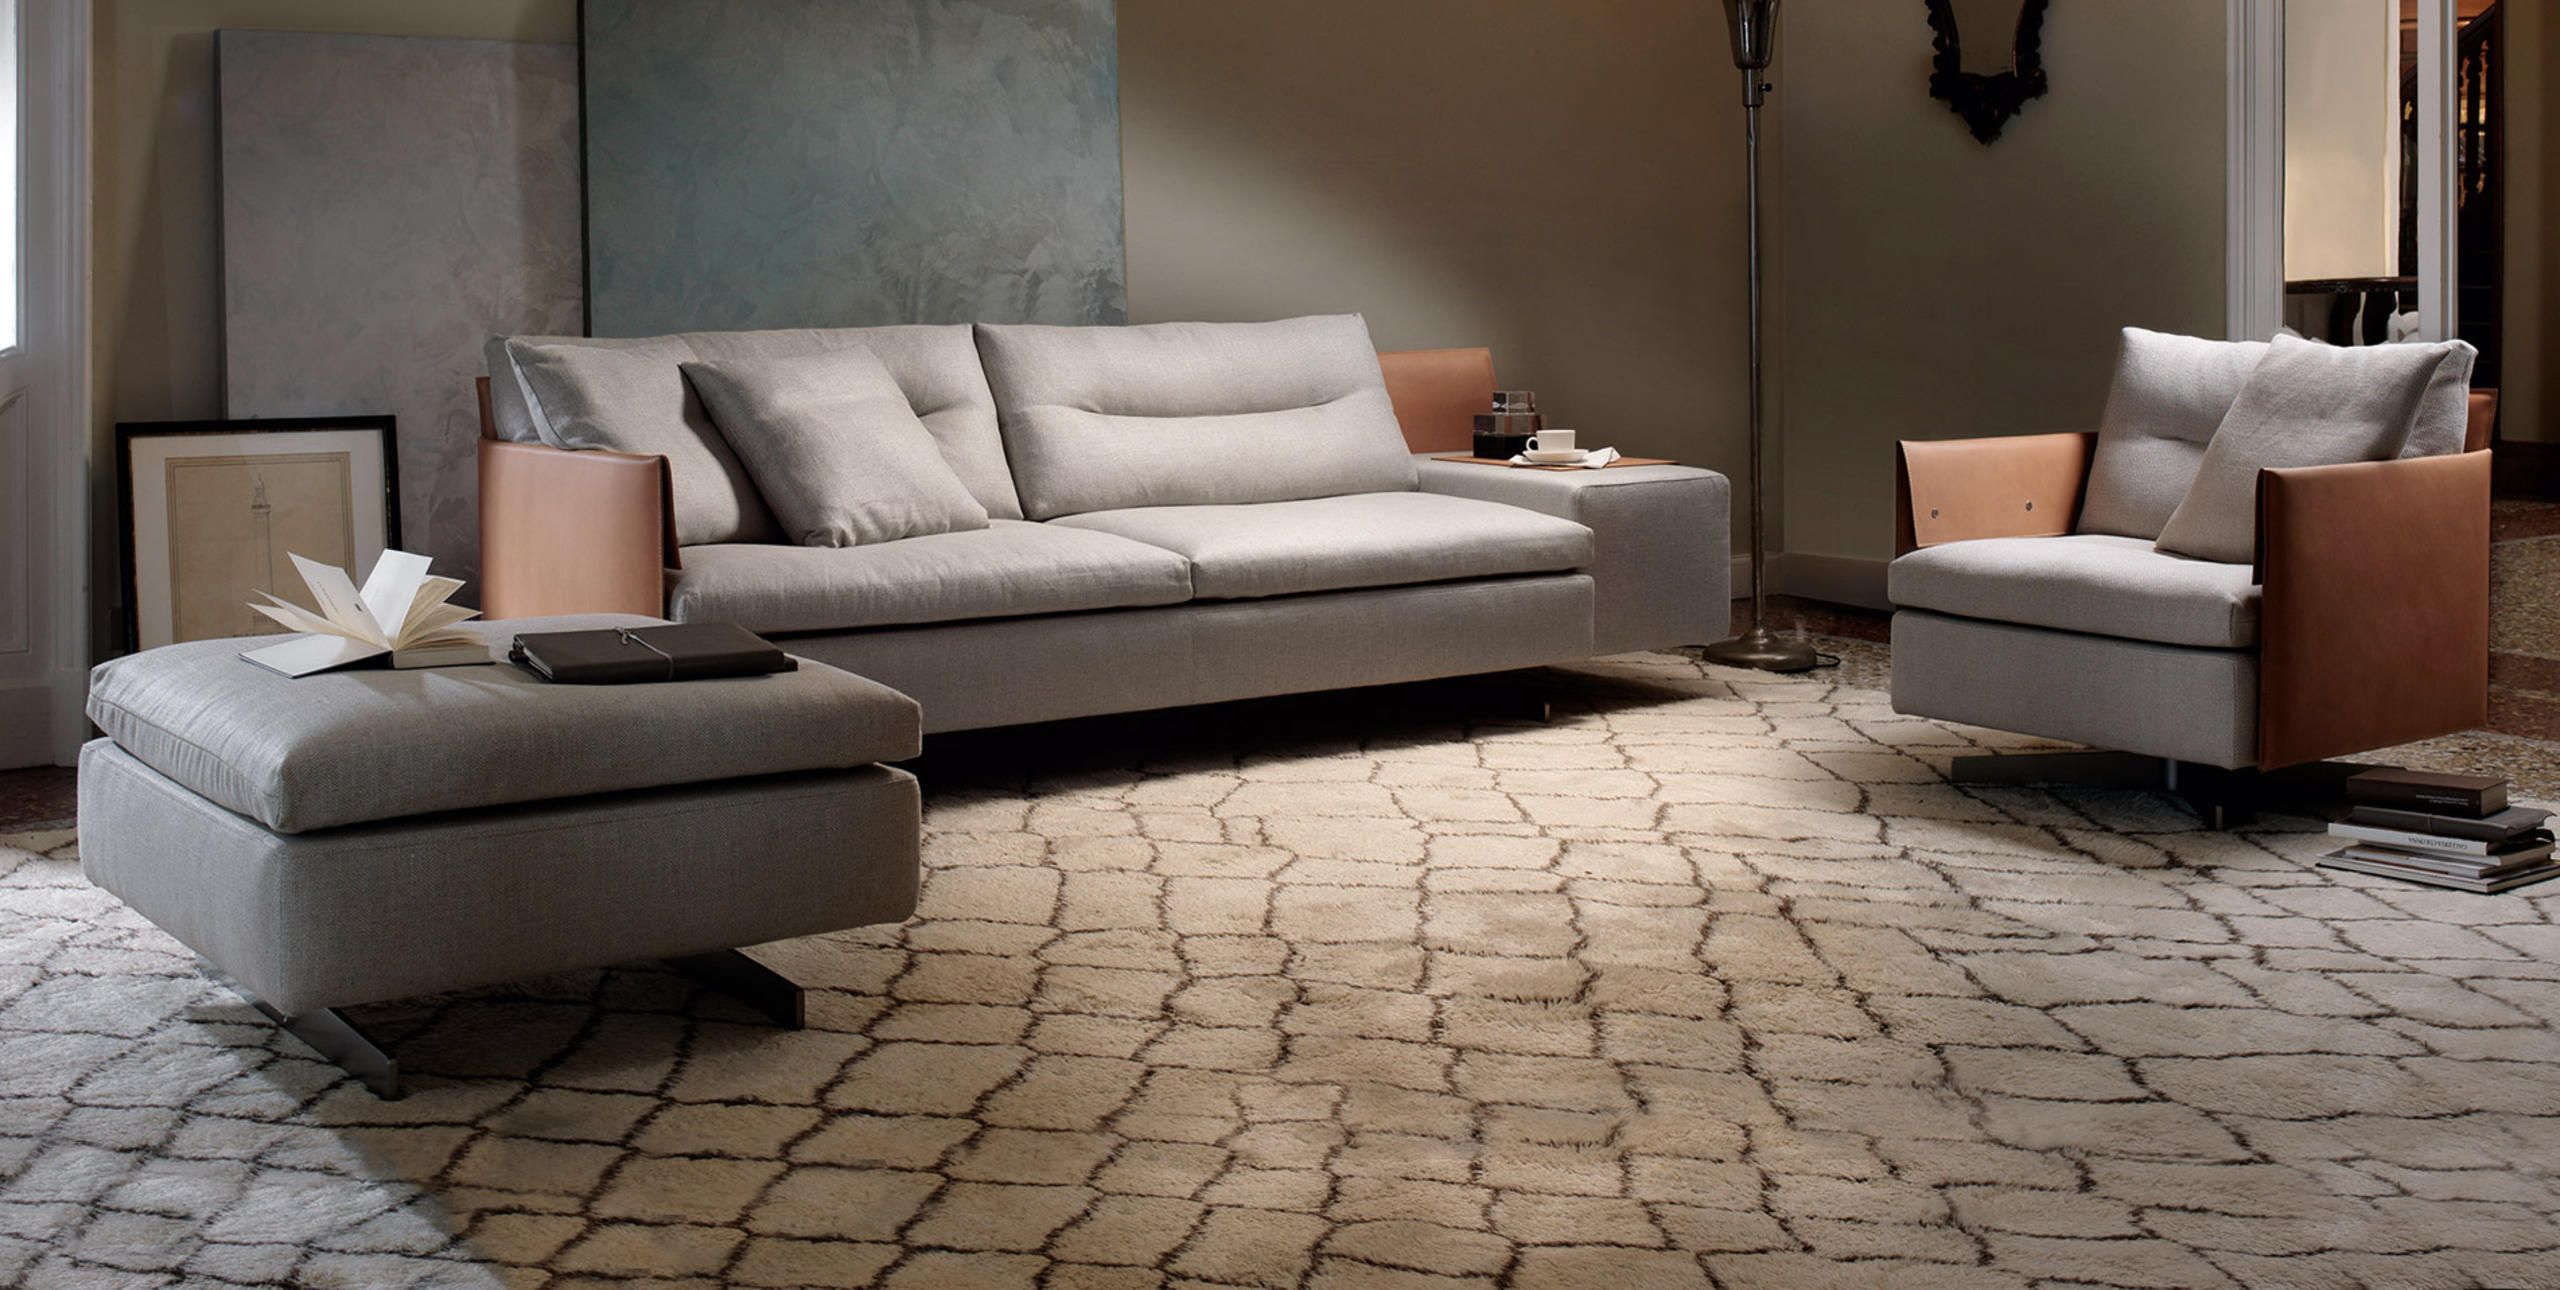 Poltrona Frau Gran Torino Modular sofa, Soft seating, Sofa